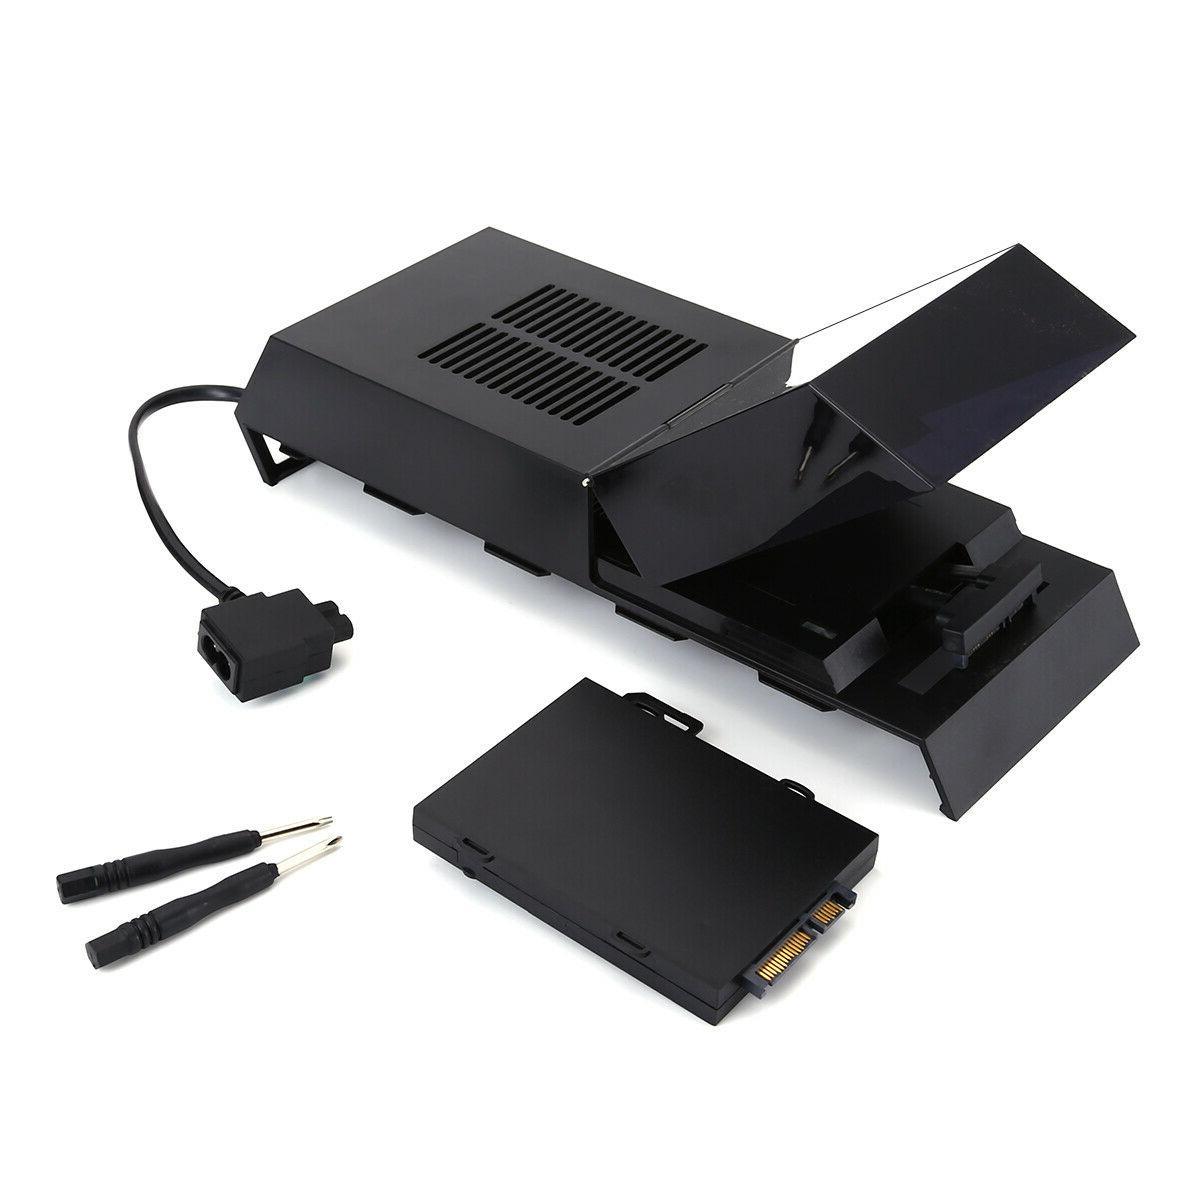 2TB External Hard HDD Data Box Playstation